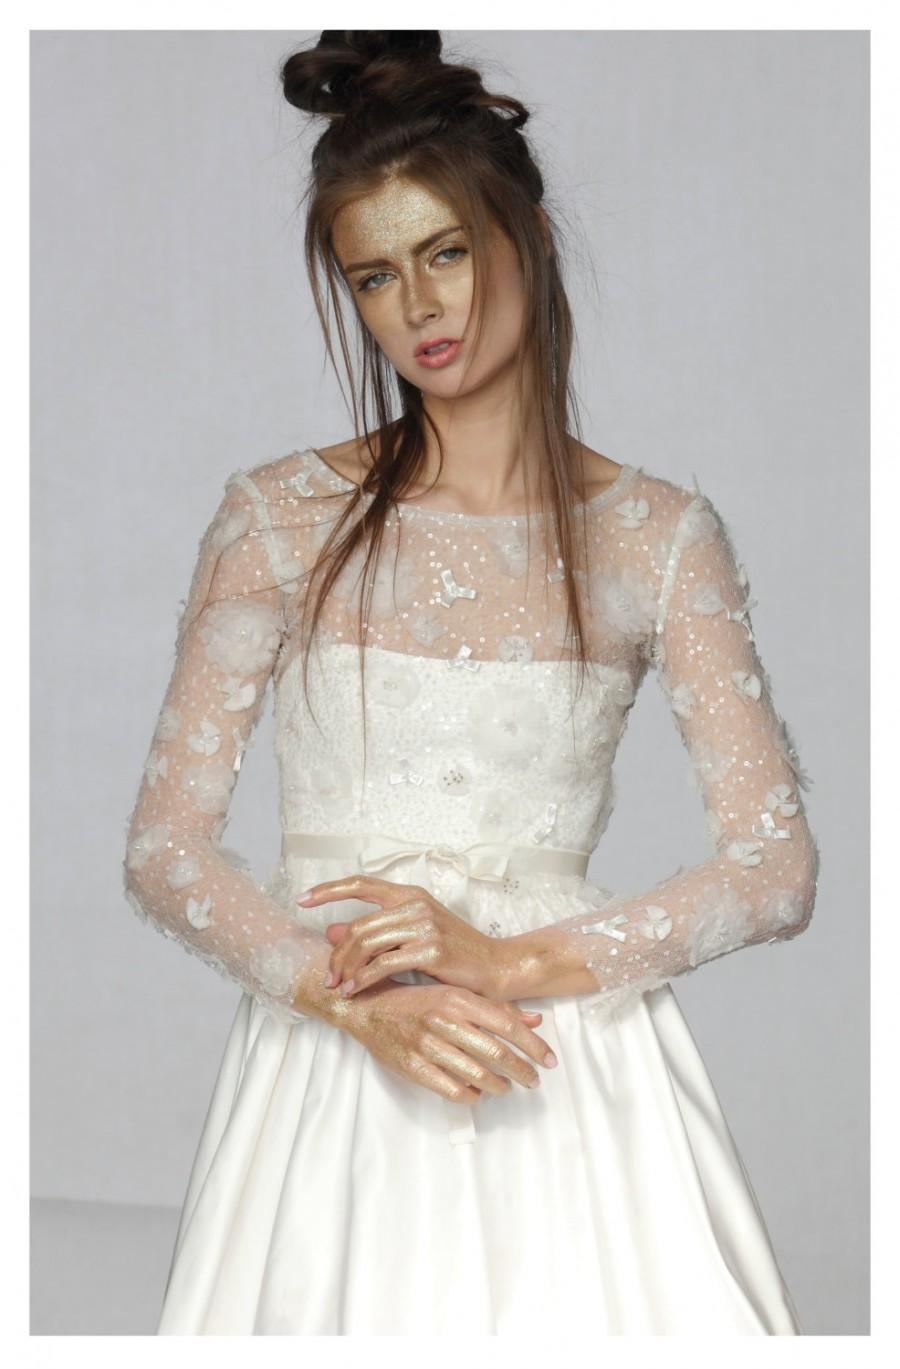 Свадьба - Bridal Lace Top, Bridal Separates, Rustic Wedding Blouse, Floral Wedding Top, Long Sleeve Wedding Top, Wedding Lace Top, Sheer Wedding Top